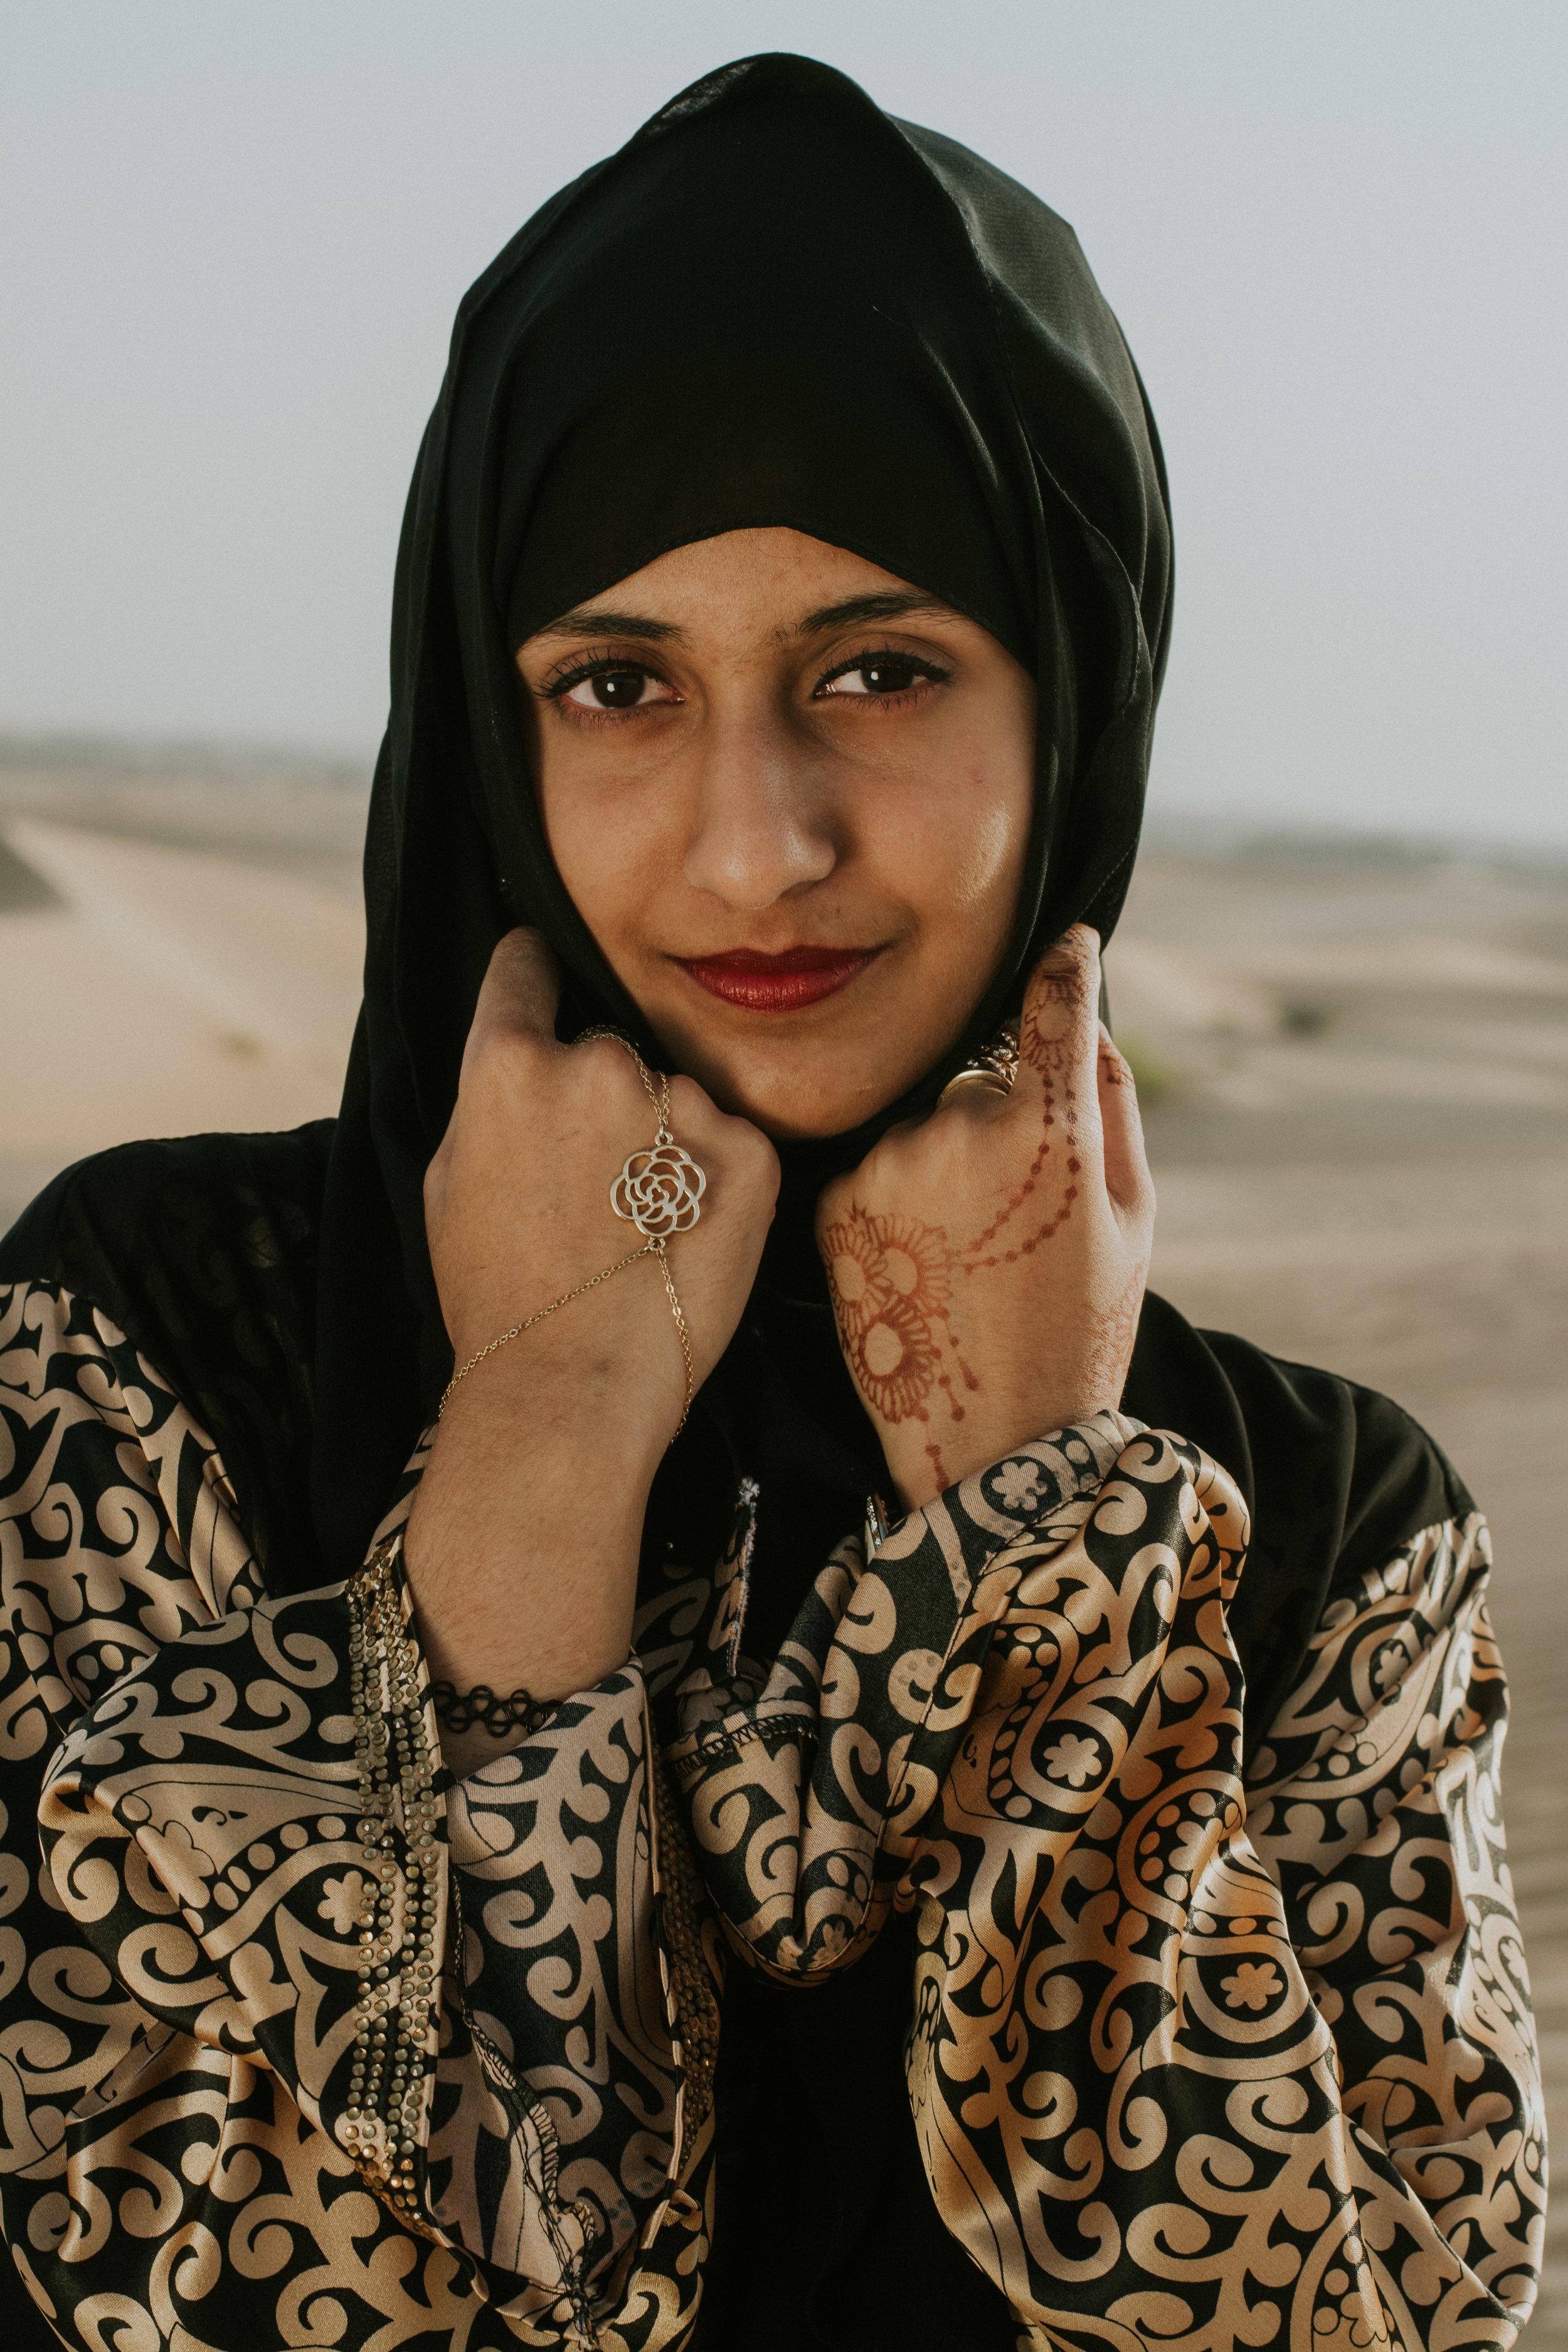 abu dhabi fashion photographer